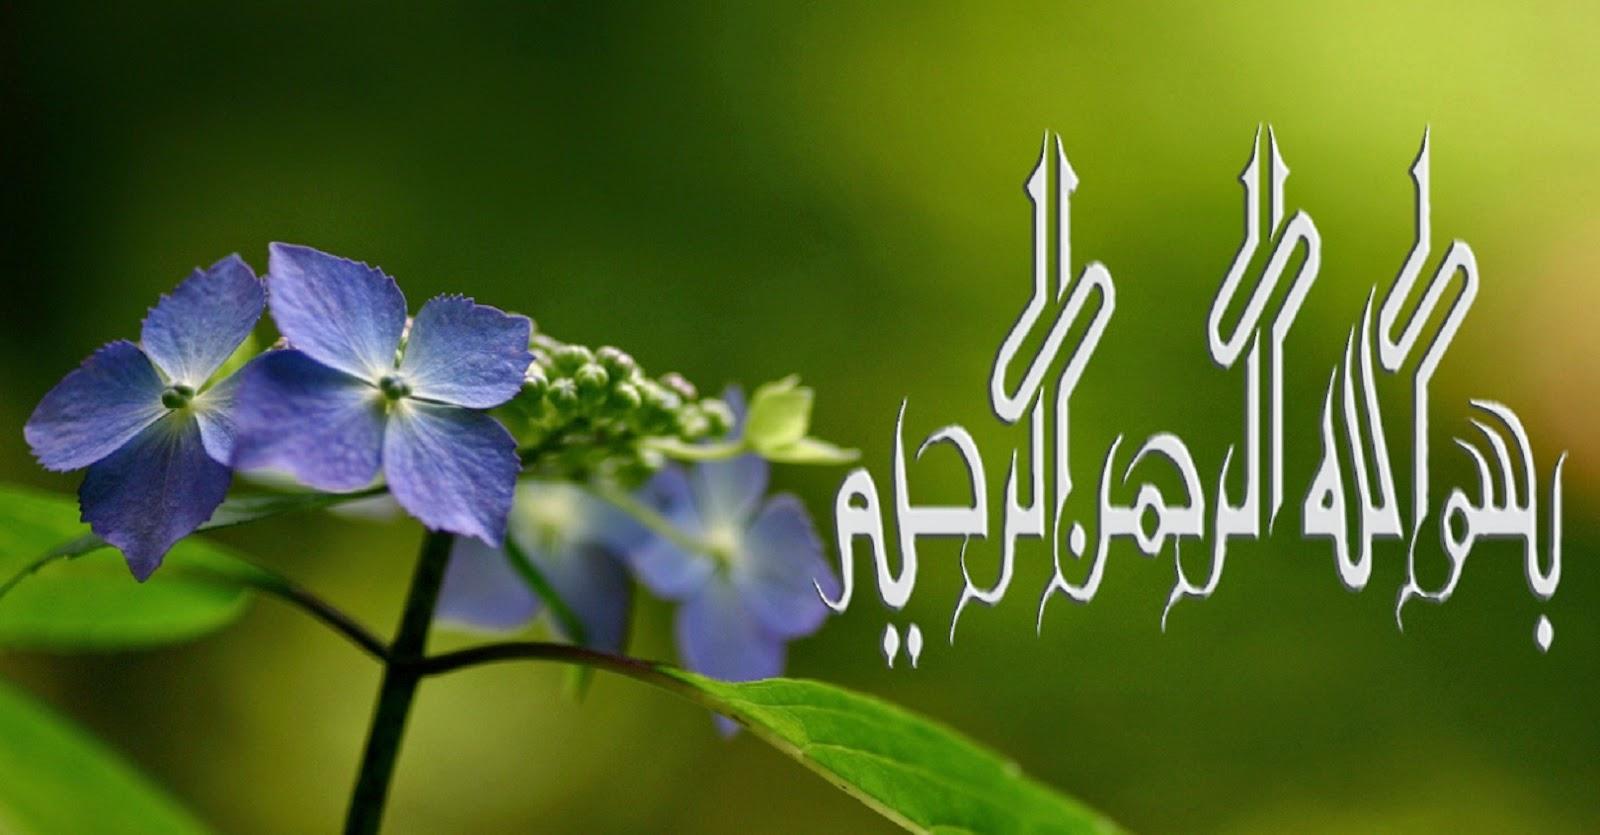 beautiful bismillah background hd wallpapers haal wallpapers